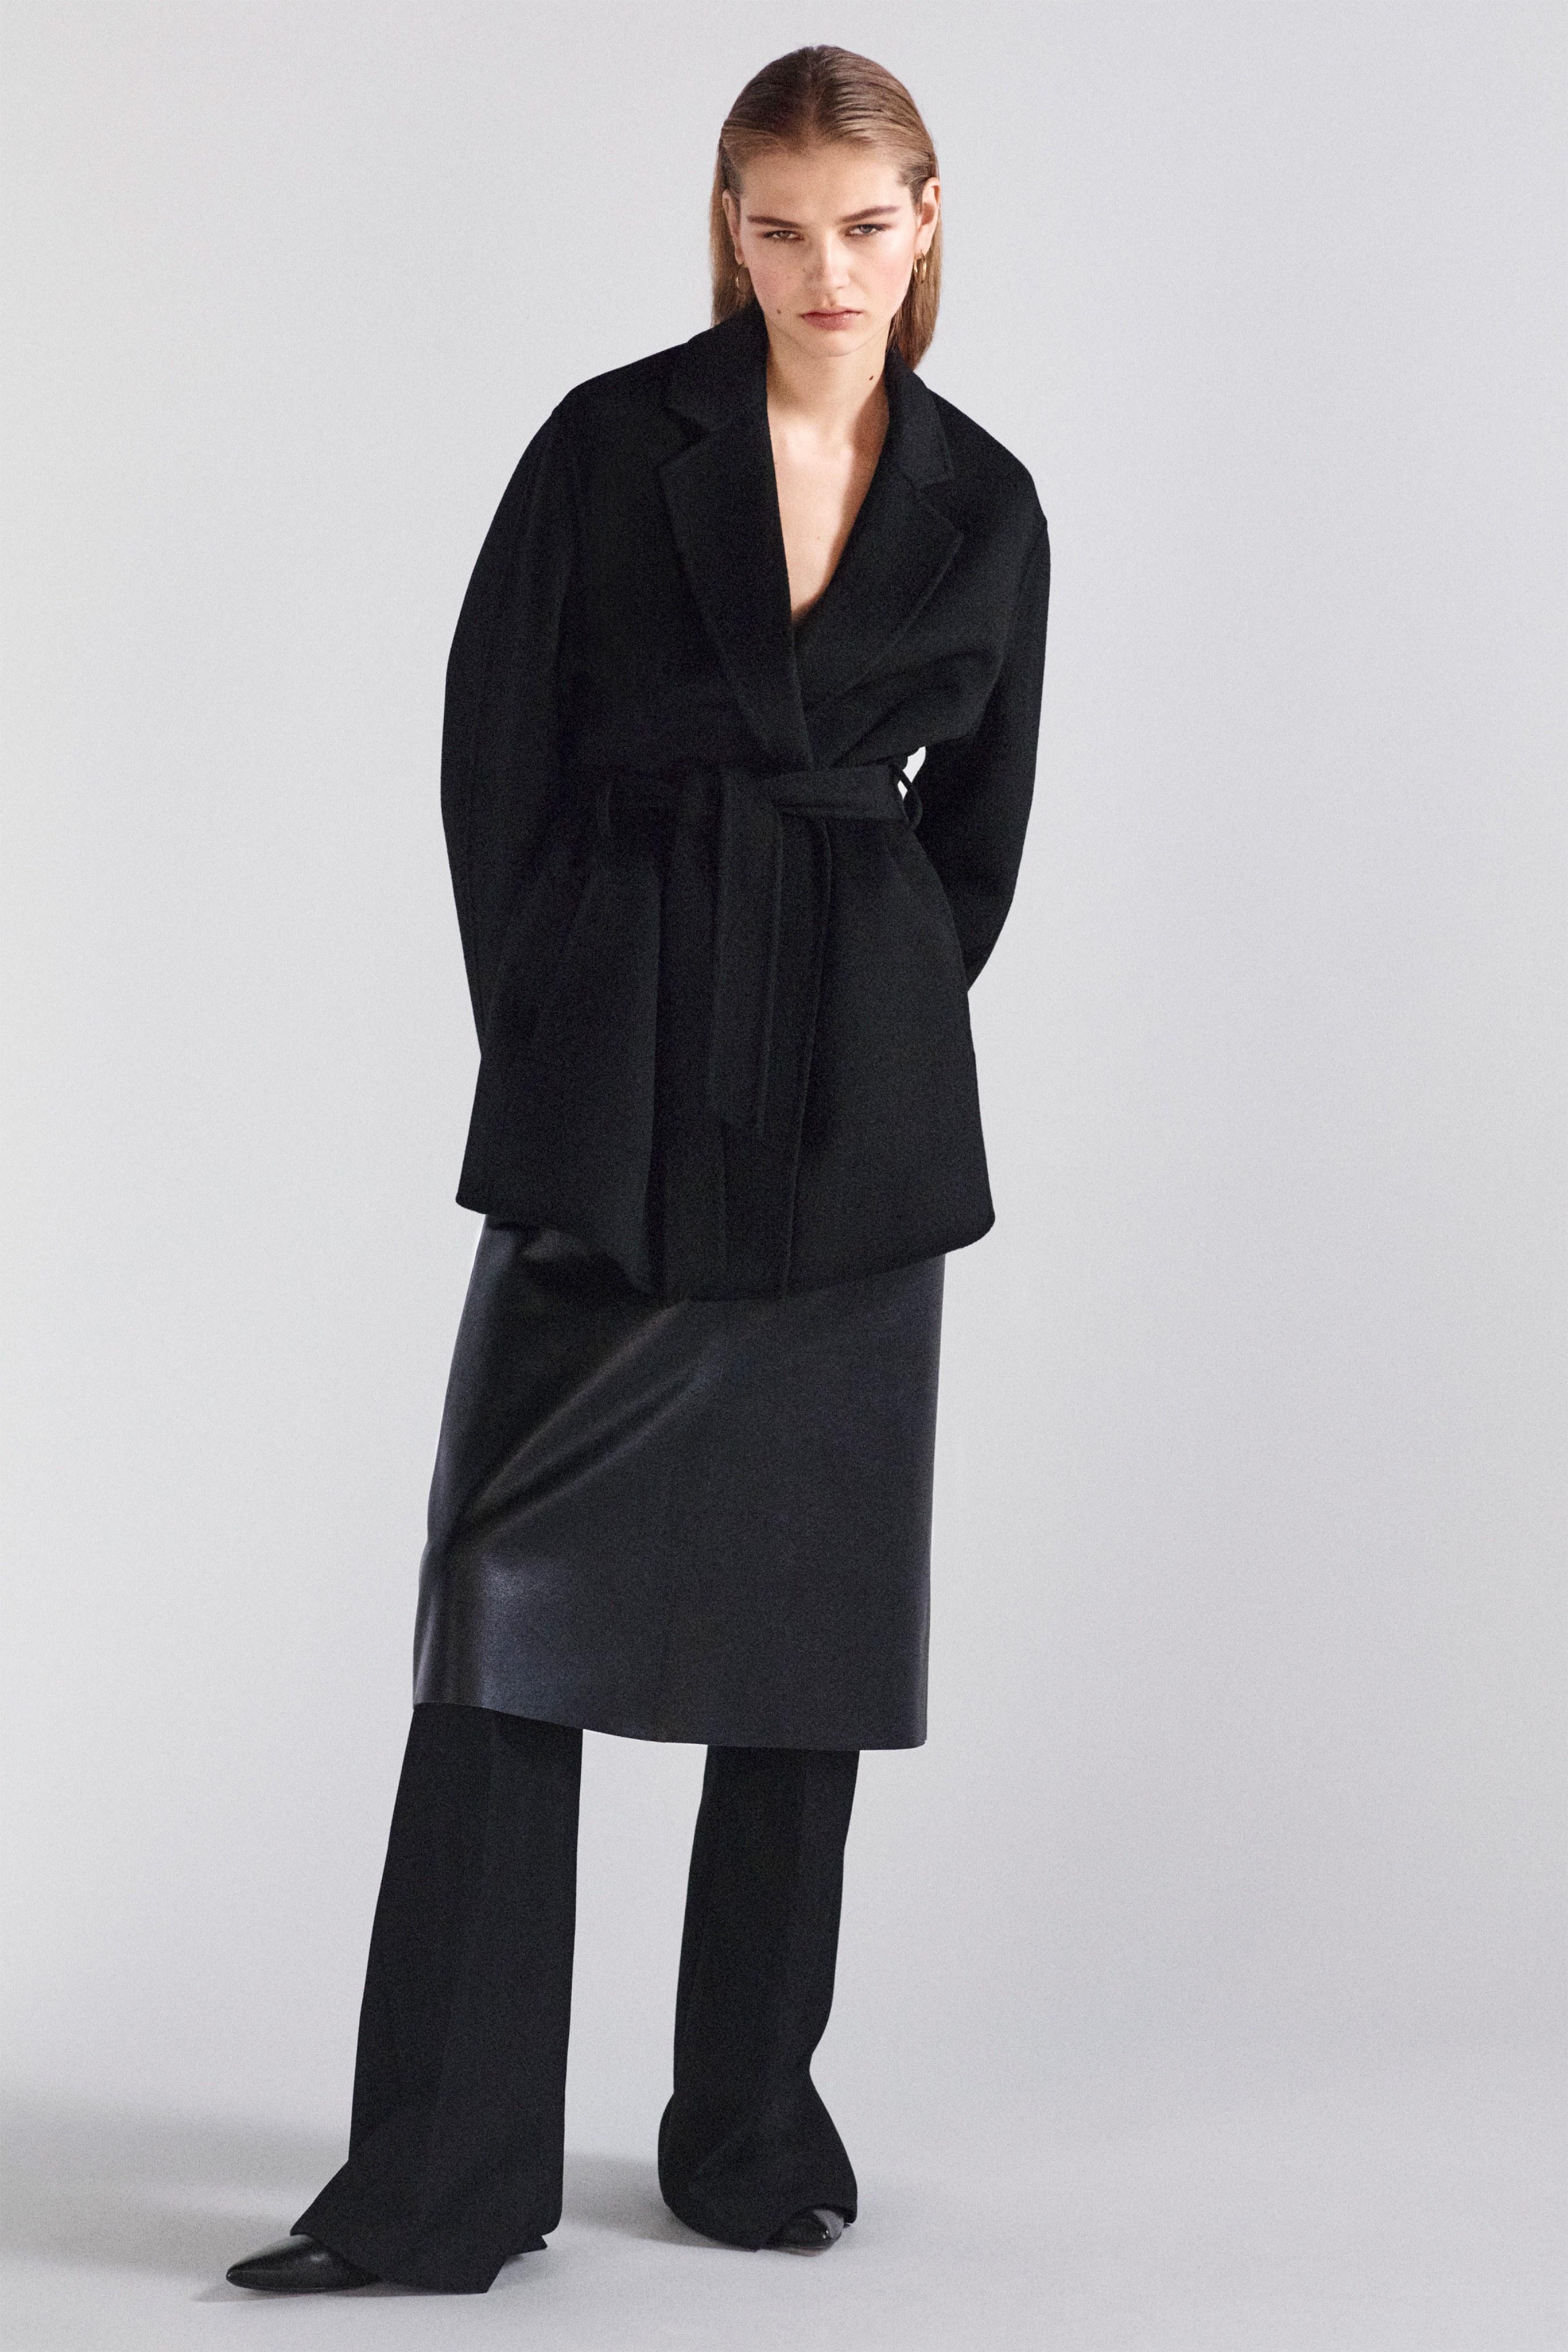 Савхин пиджак, макси юбка болон бусад дурсамж сэргээсэн 2020 оны ретро трендүүд (фото 10)